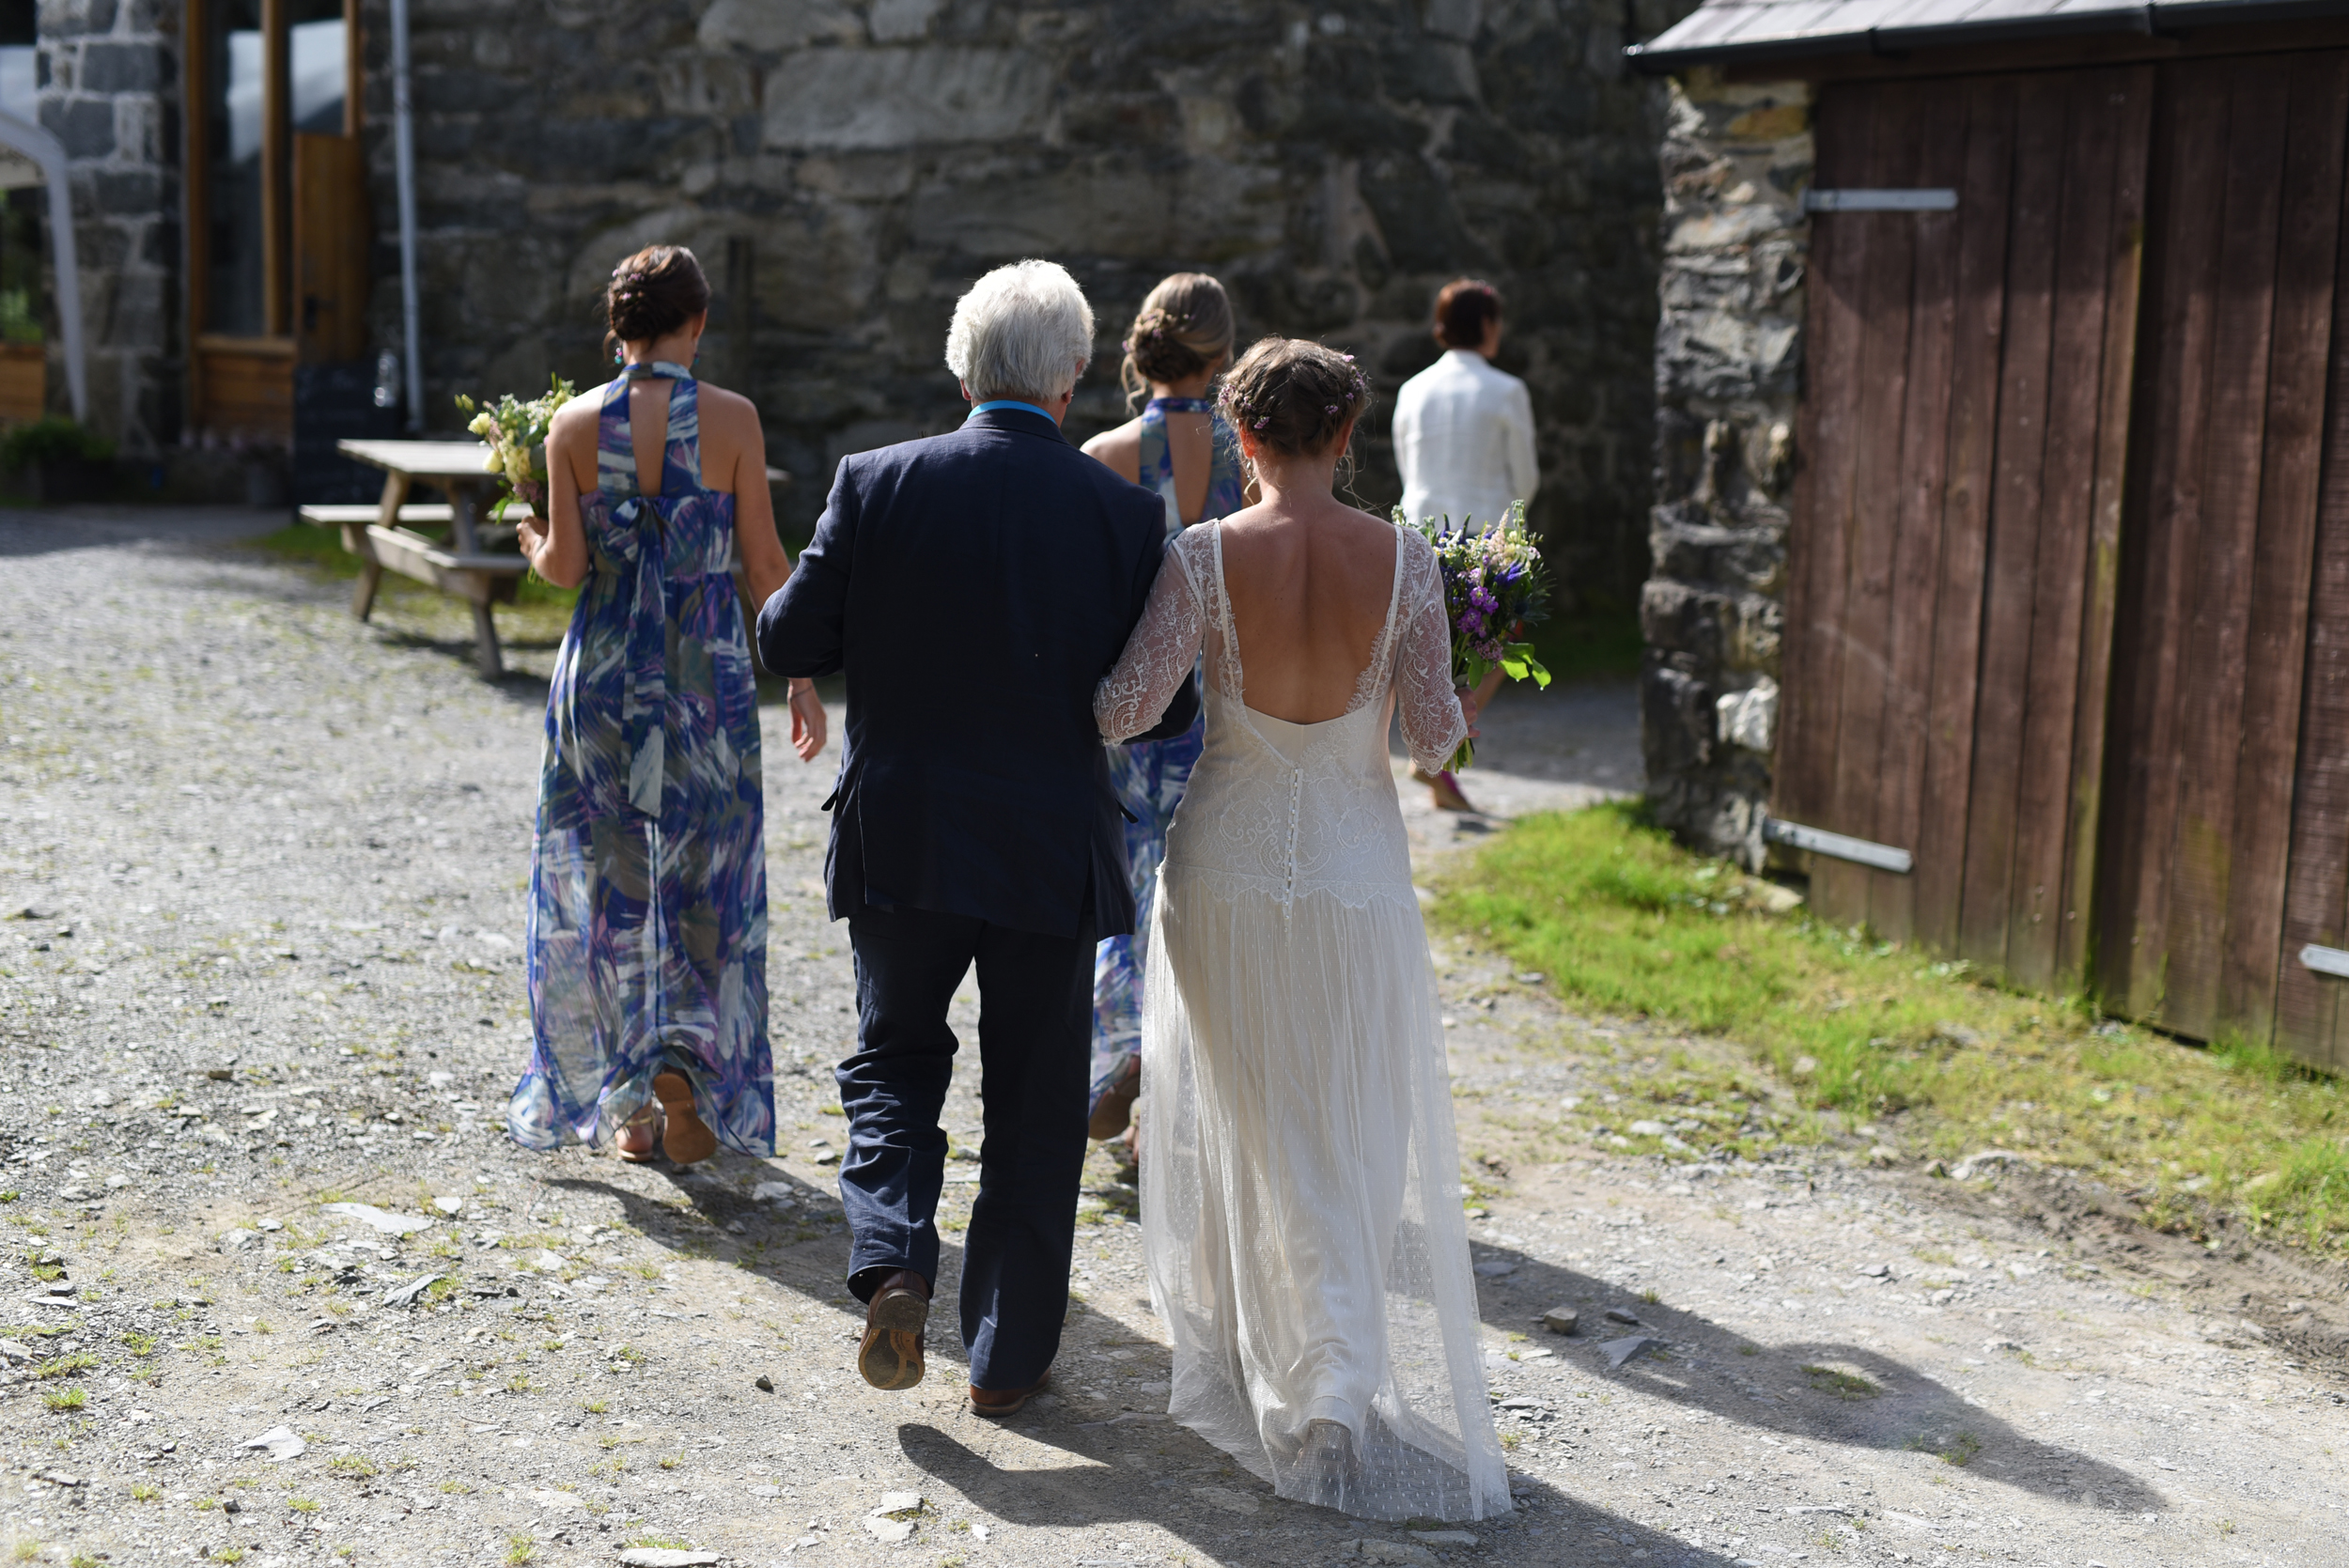 Miriam-Bespoke-Lace-Wedding-Dress-Kate-Beaumont-Sheffield-3.jpg